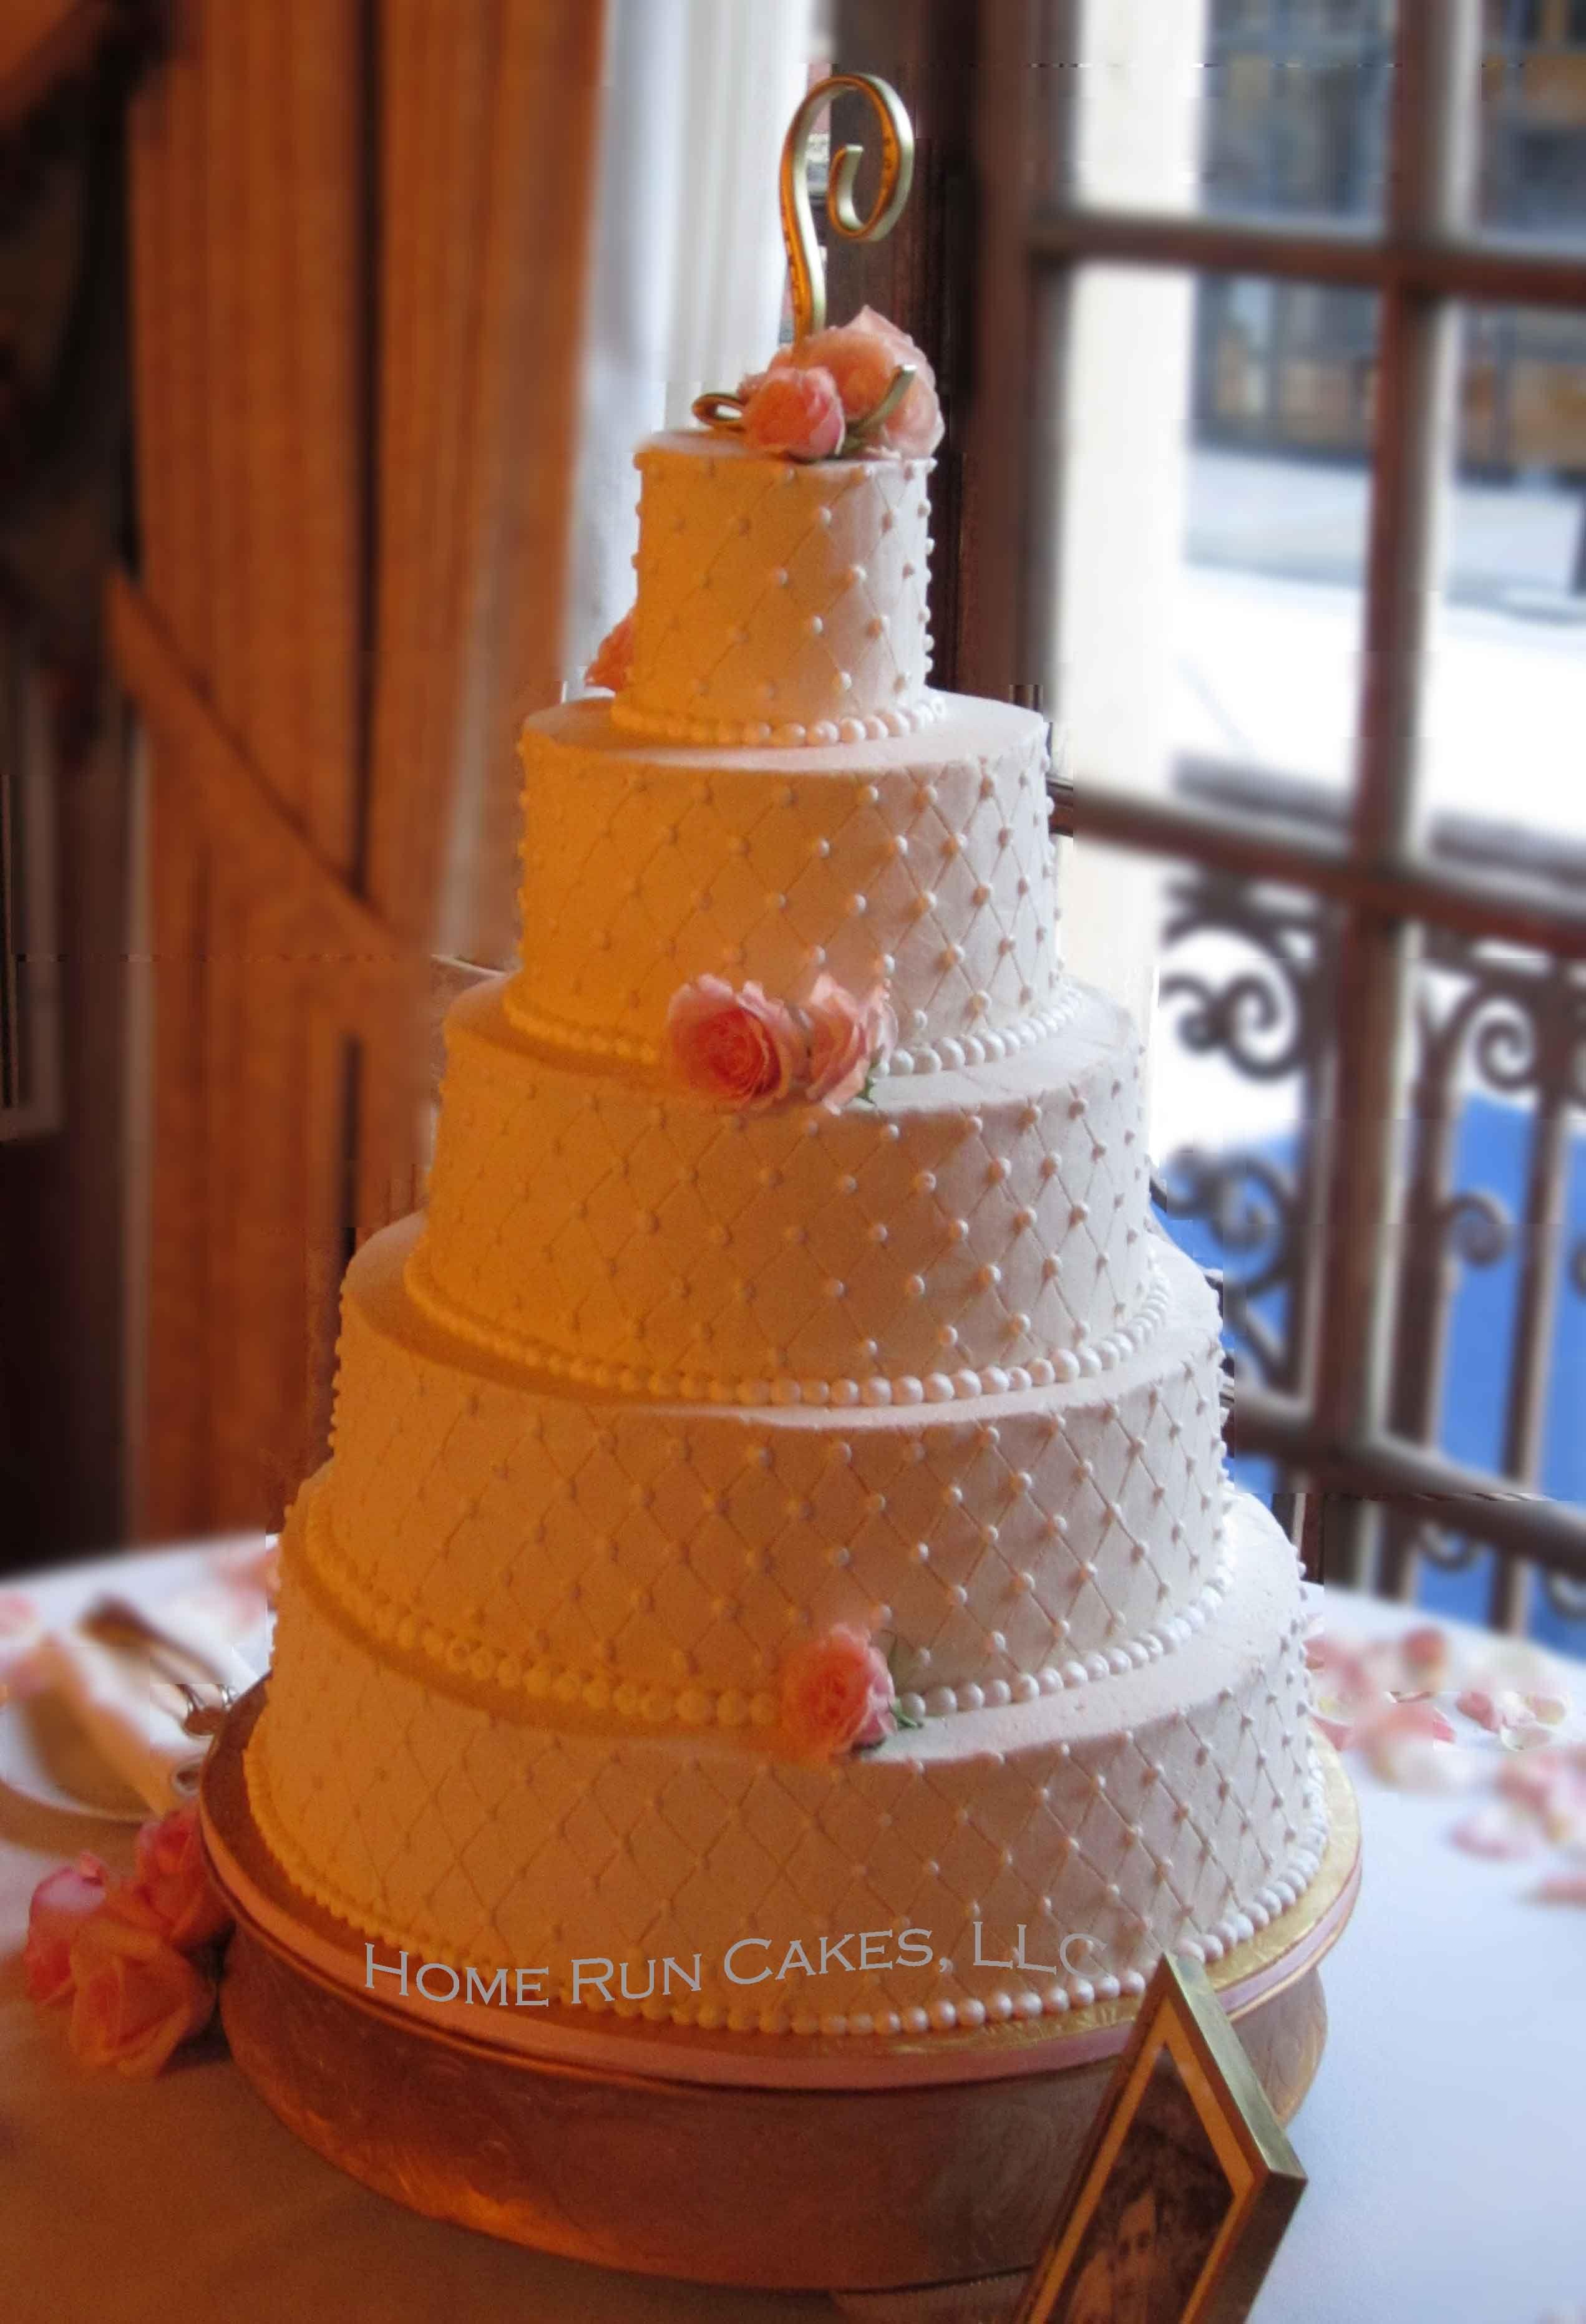 Home Run Cakes Cake Gallery Wedding Cakes Pinterest Wedding